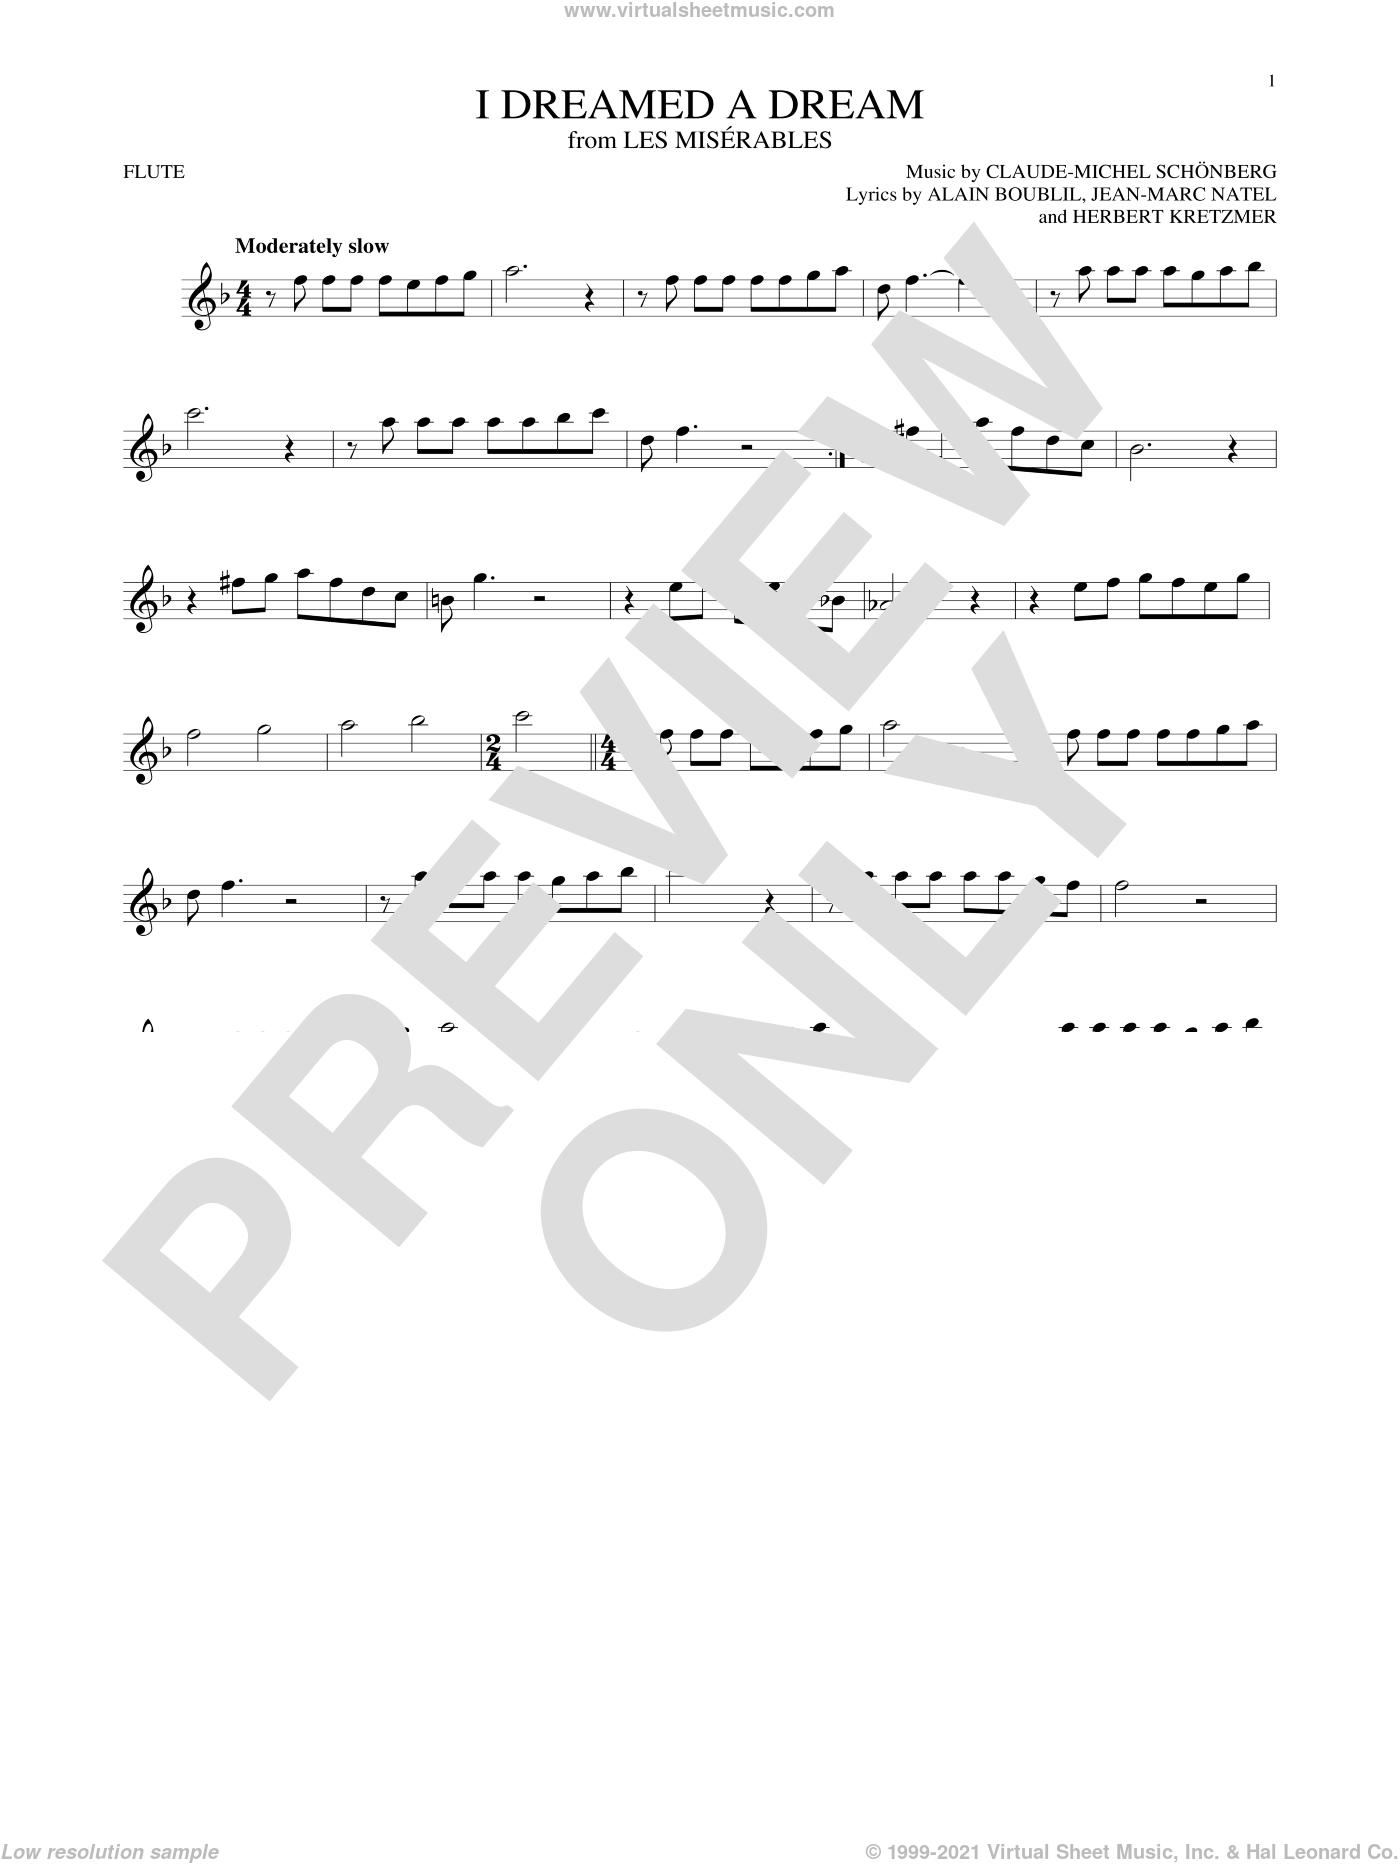 I Dreamed A Dream sheet music for flute solo by Claude-Michel Schonberg, intermediate skill level